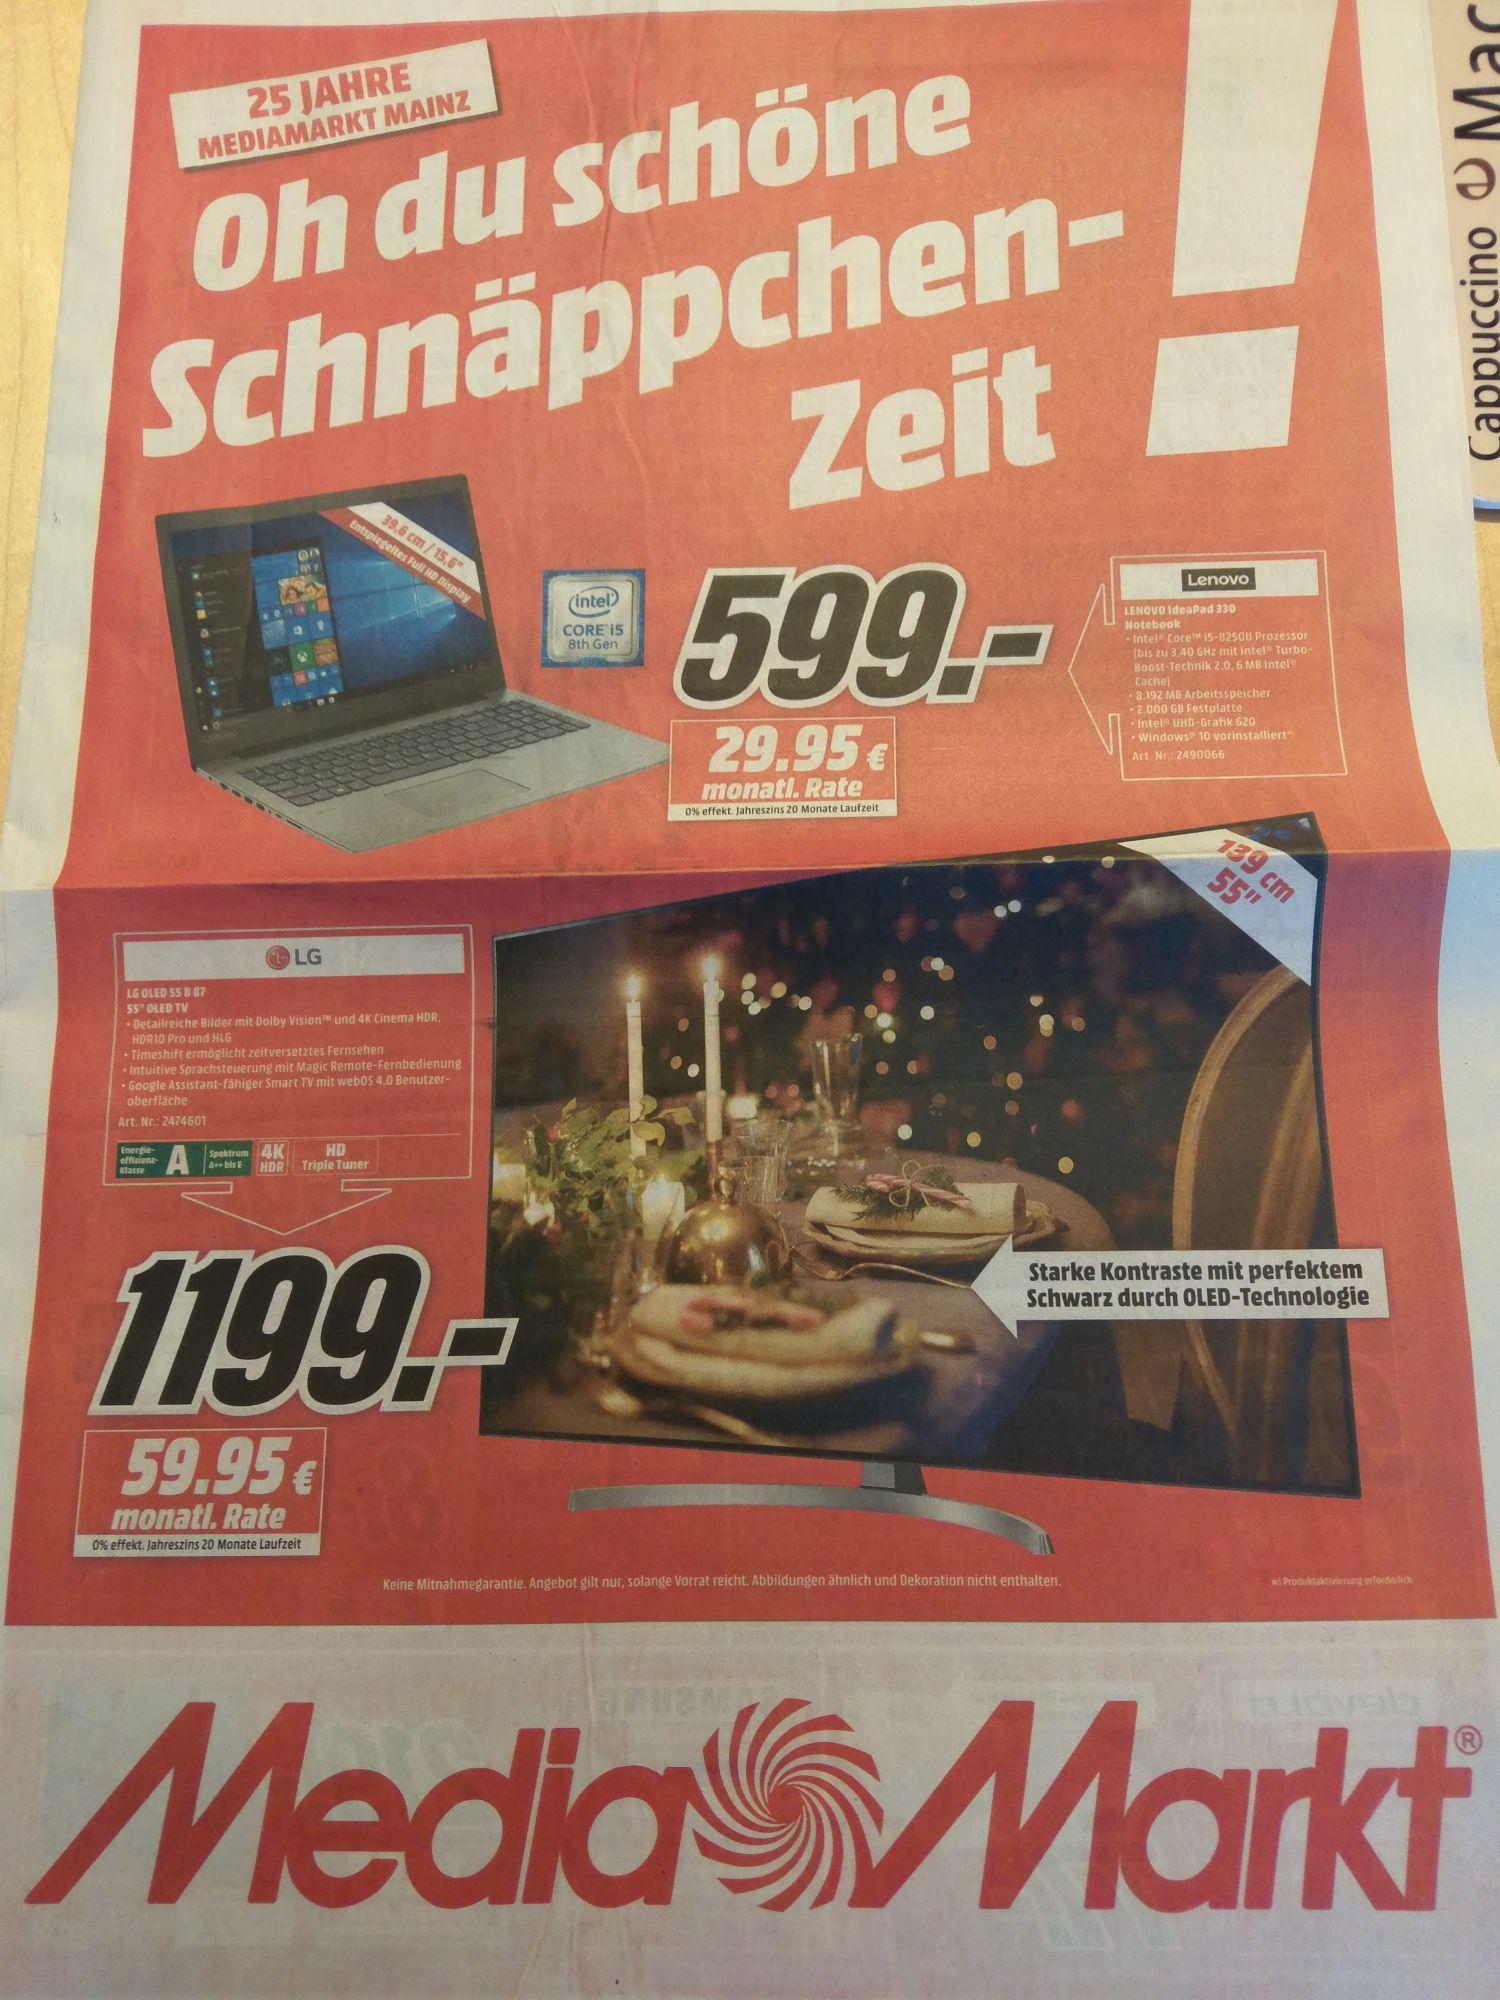 Lokal Media Markt Mainz LG Oled 55 B87 - 1199€